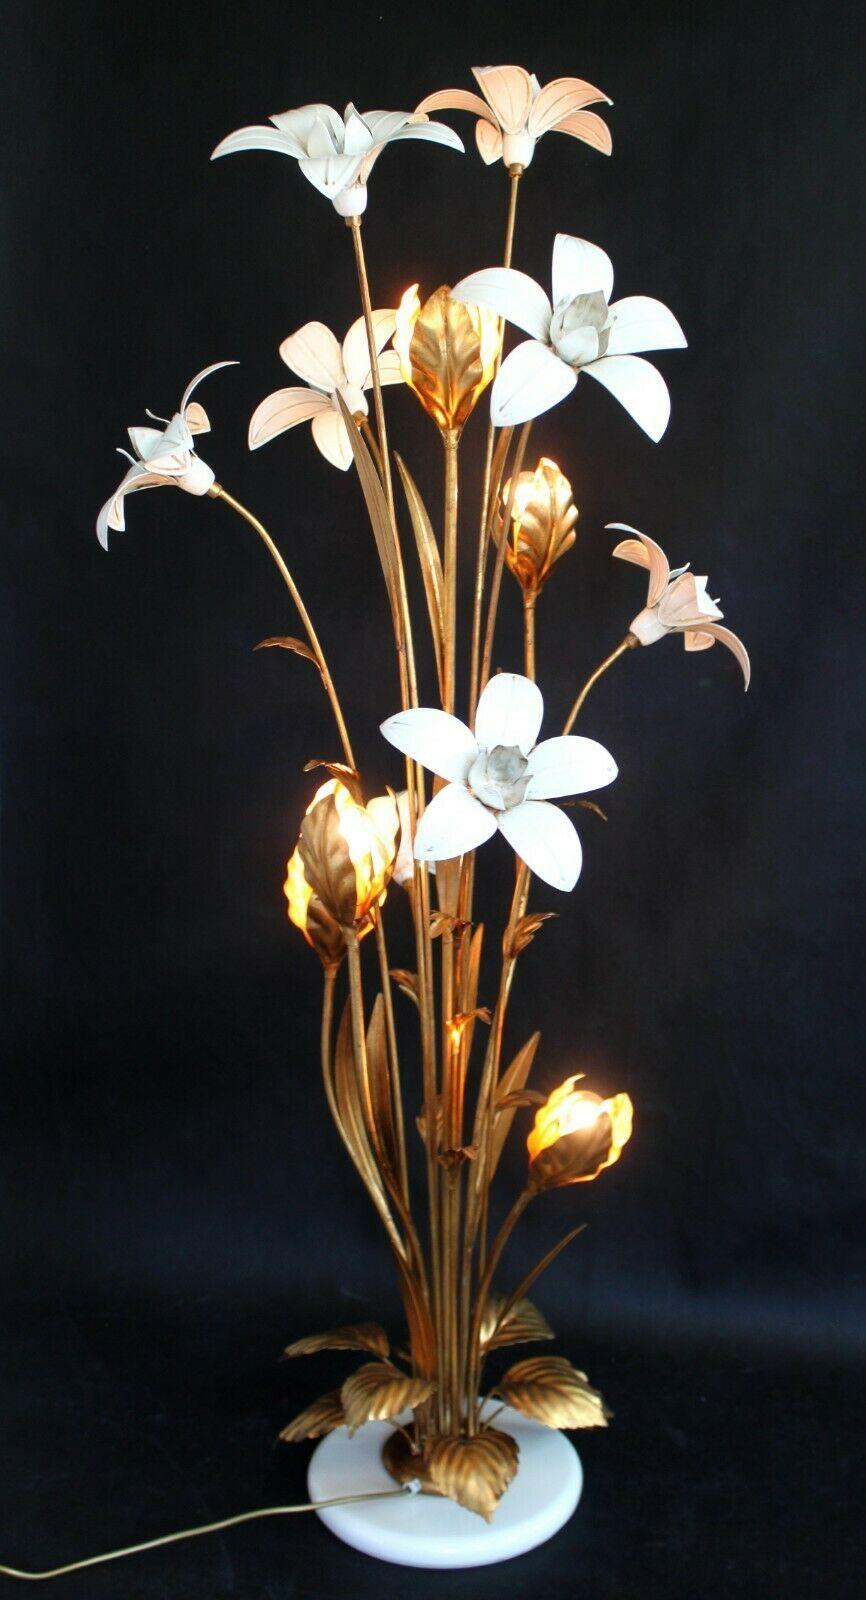 Original Florentiner Lampe Stehlampe Mid Century Design Hans Kogl Koegl Ebay Mid Century Design Decor Home Decor